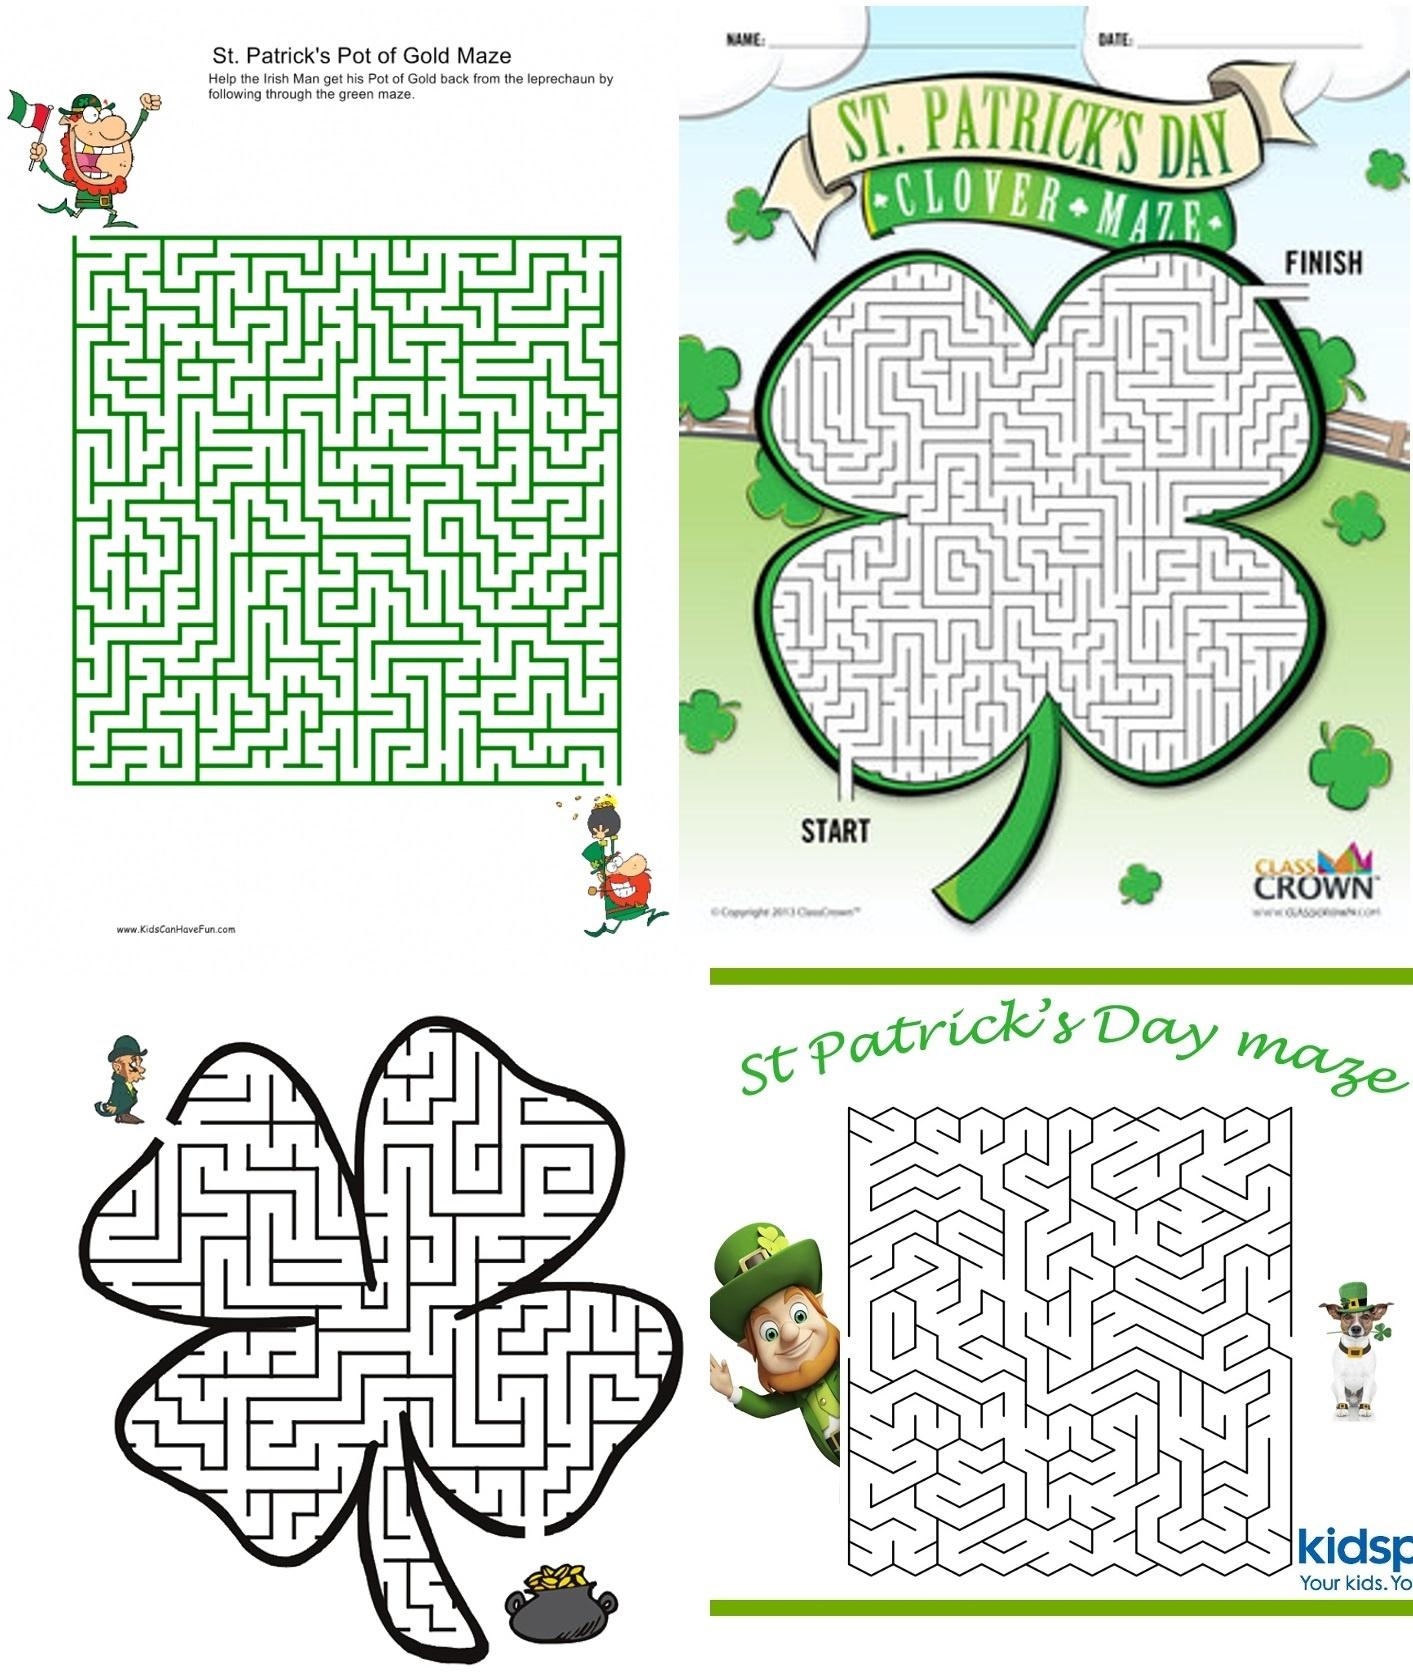 12 St. Patrick's Day Game Printables - Printables 4 Mom - Free Printable St Patrick's Day Mazes